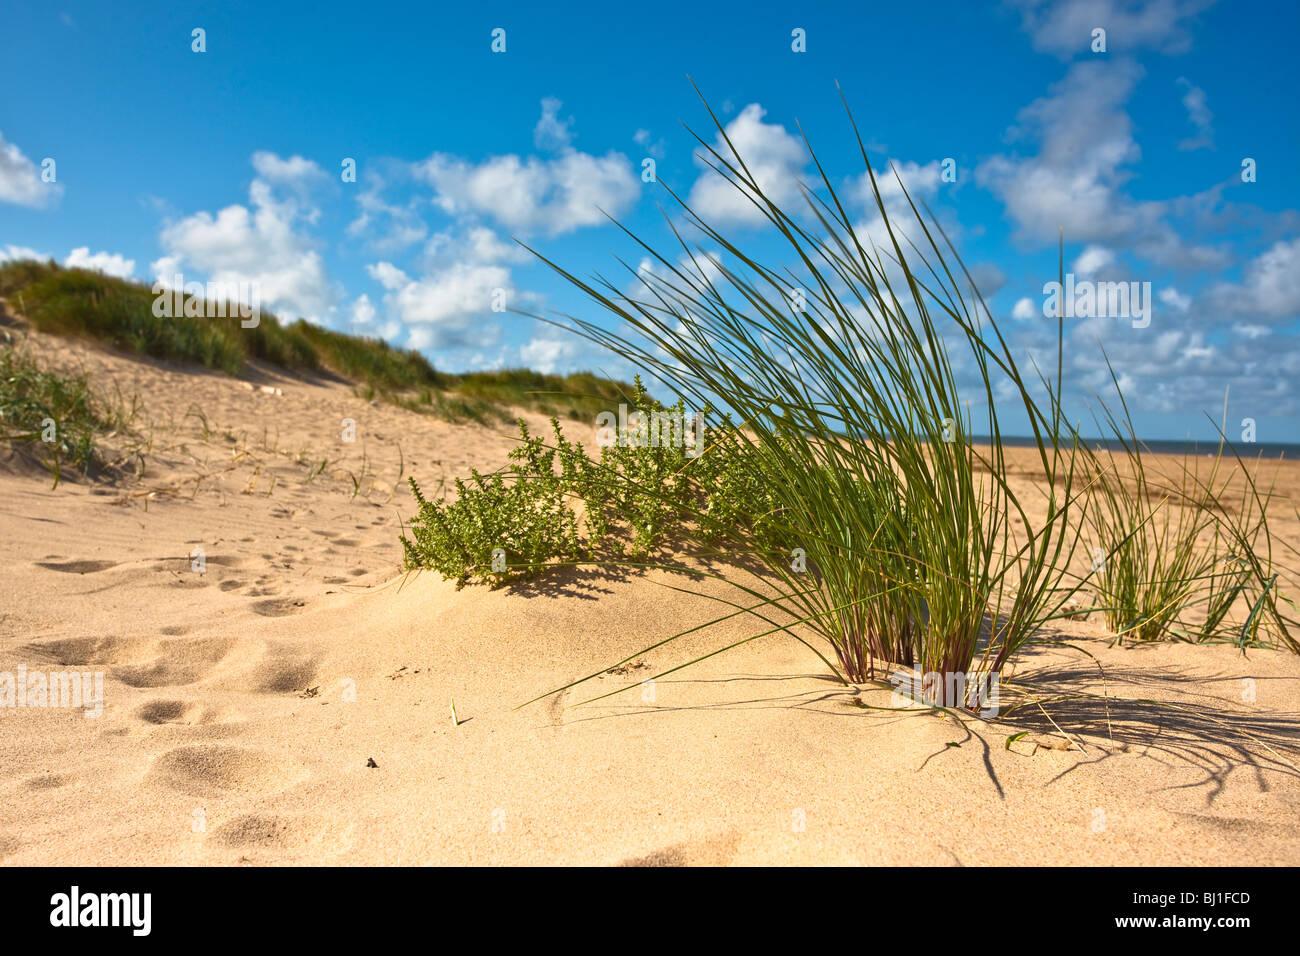 A clump of Marram grass on the beach at Thornham, Norfolk - Stock Image